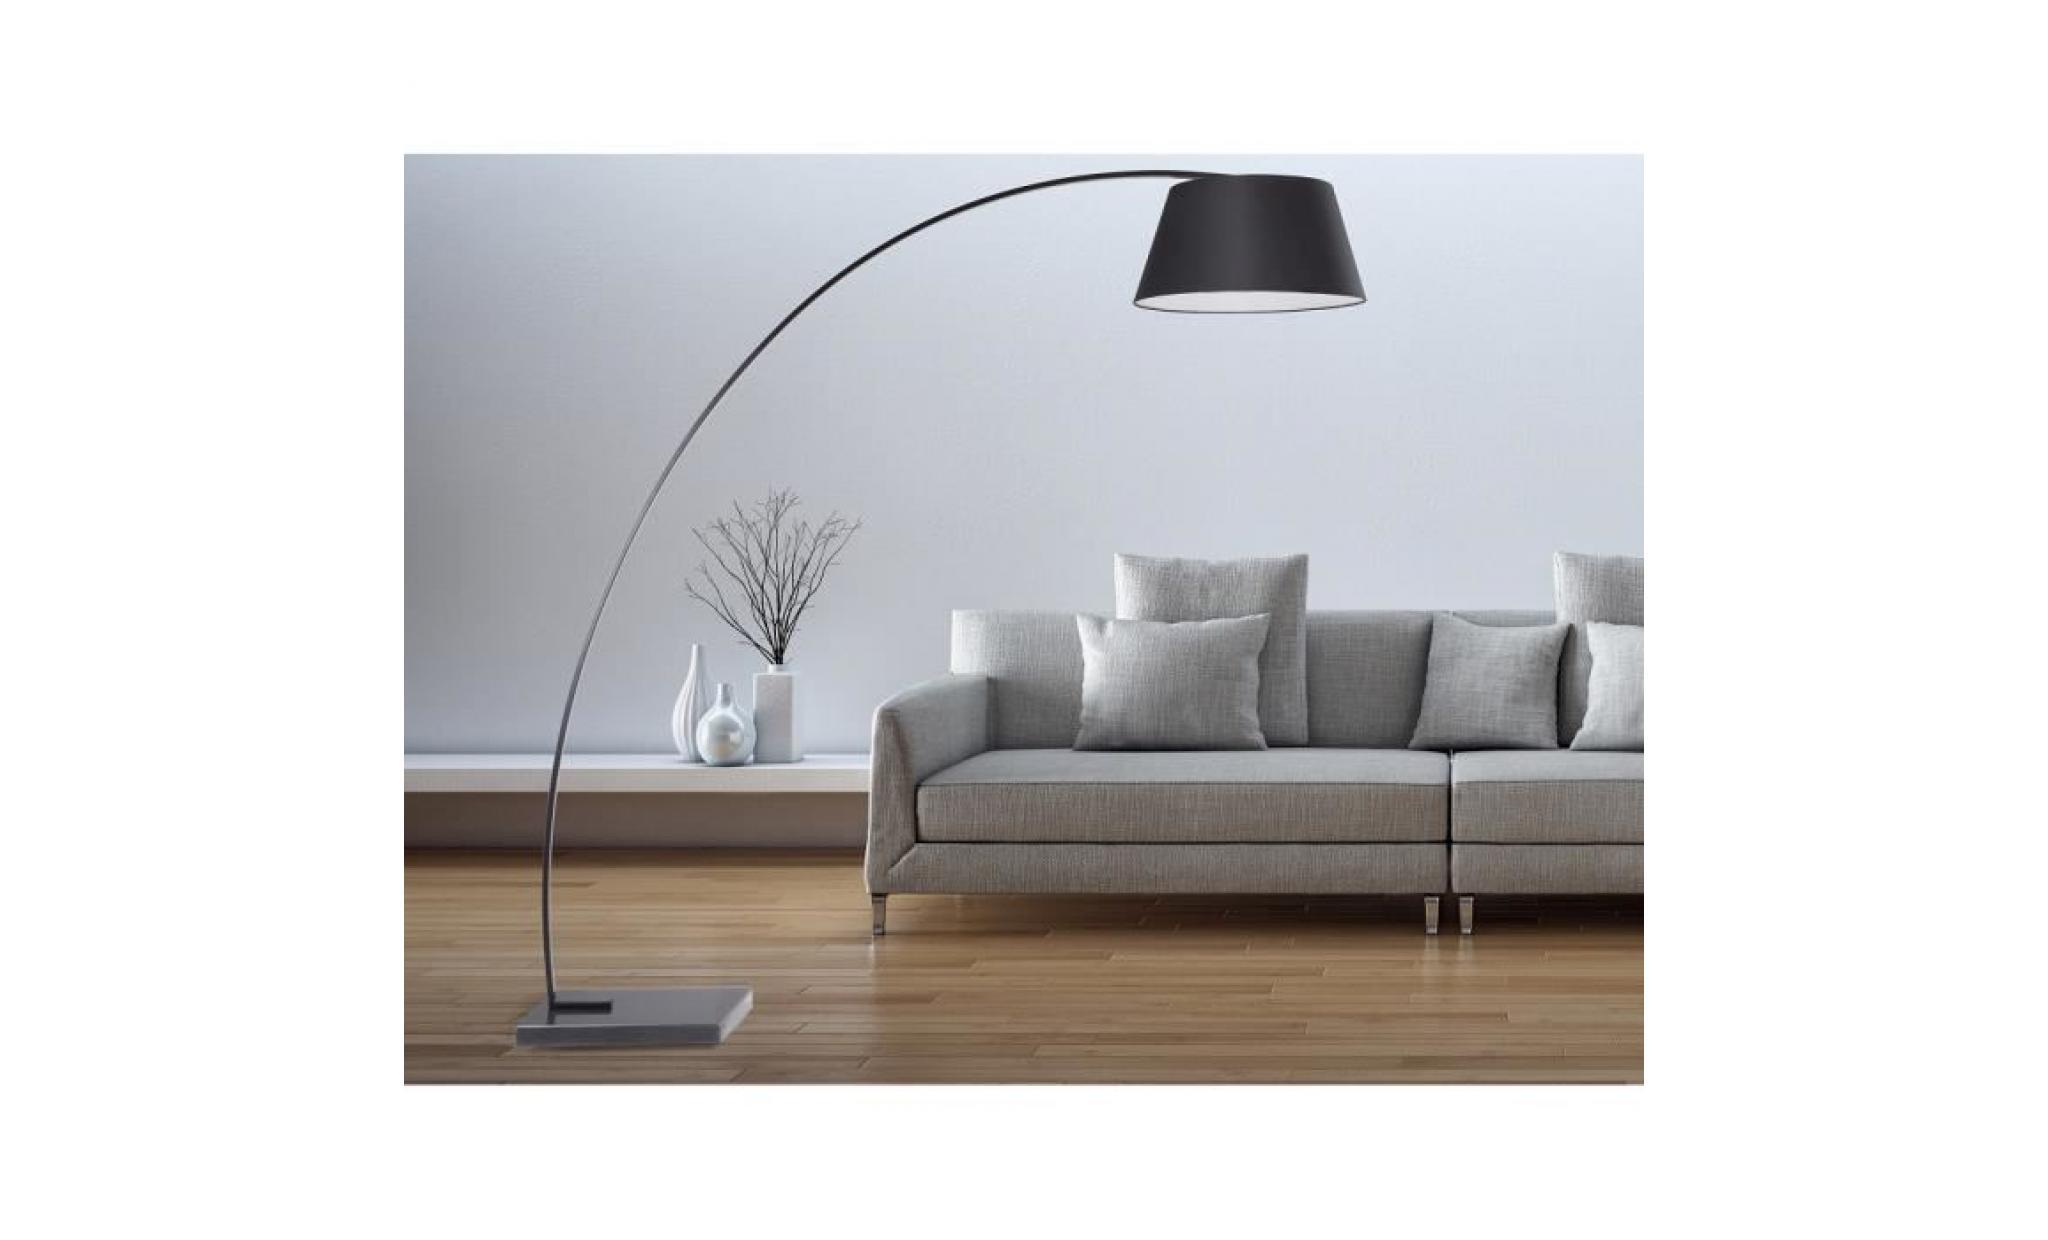 Lampadaire design - luminaire - lampe de salon - noir - Rio Grande